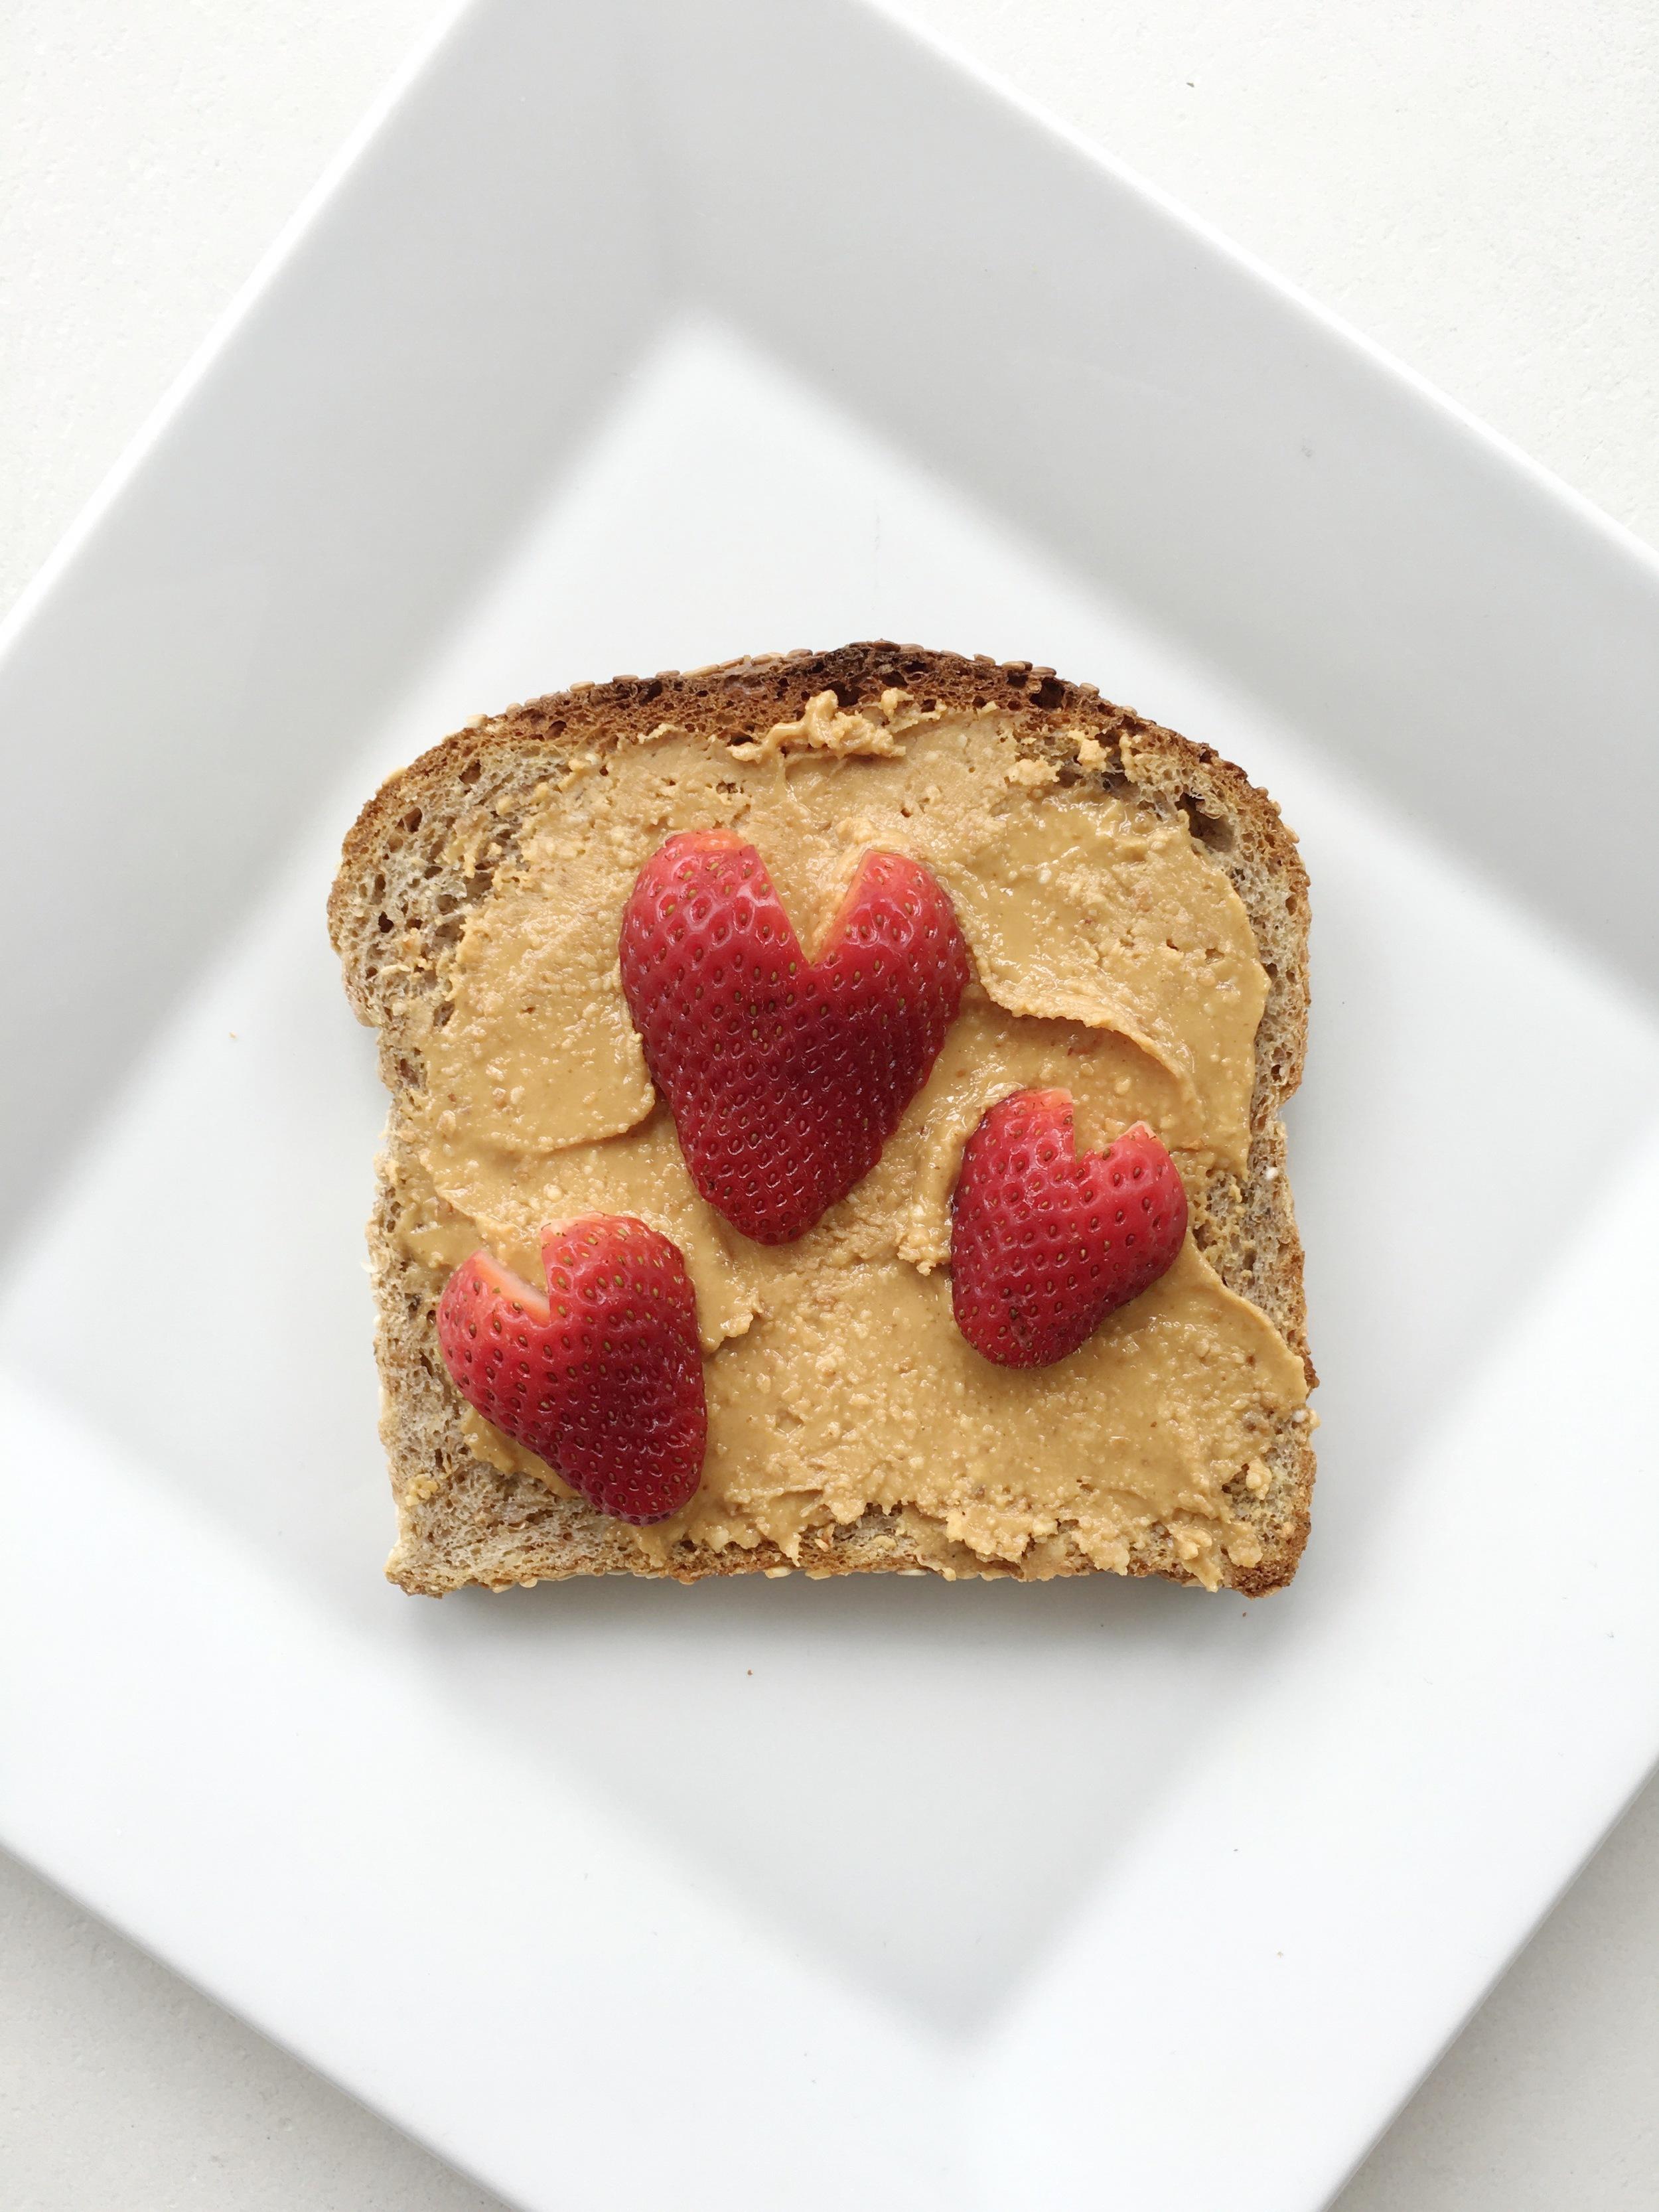 peanut butter + strawberry